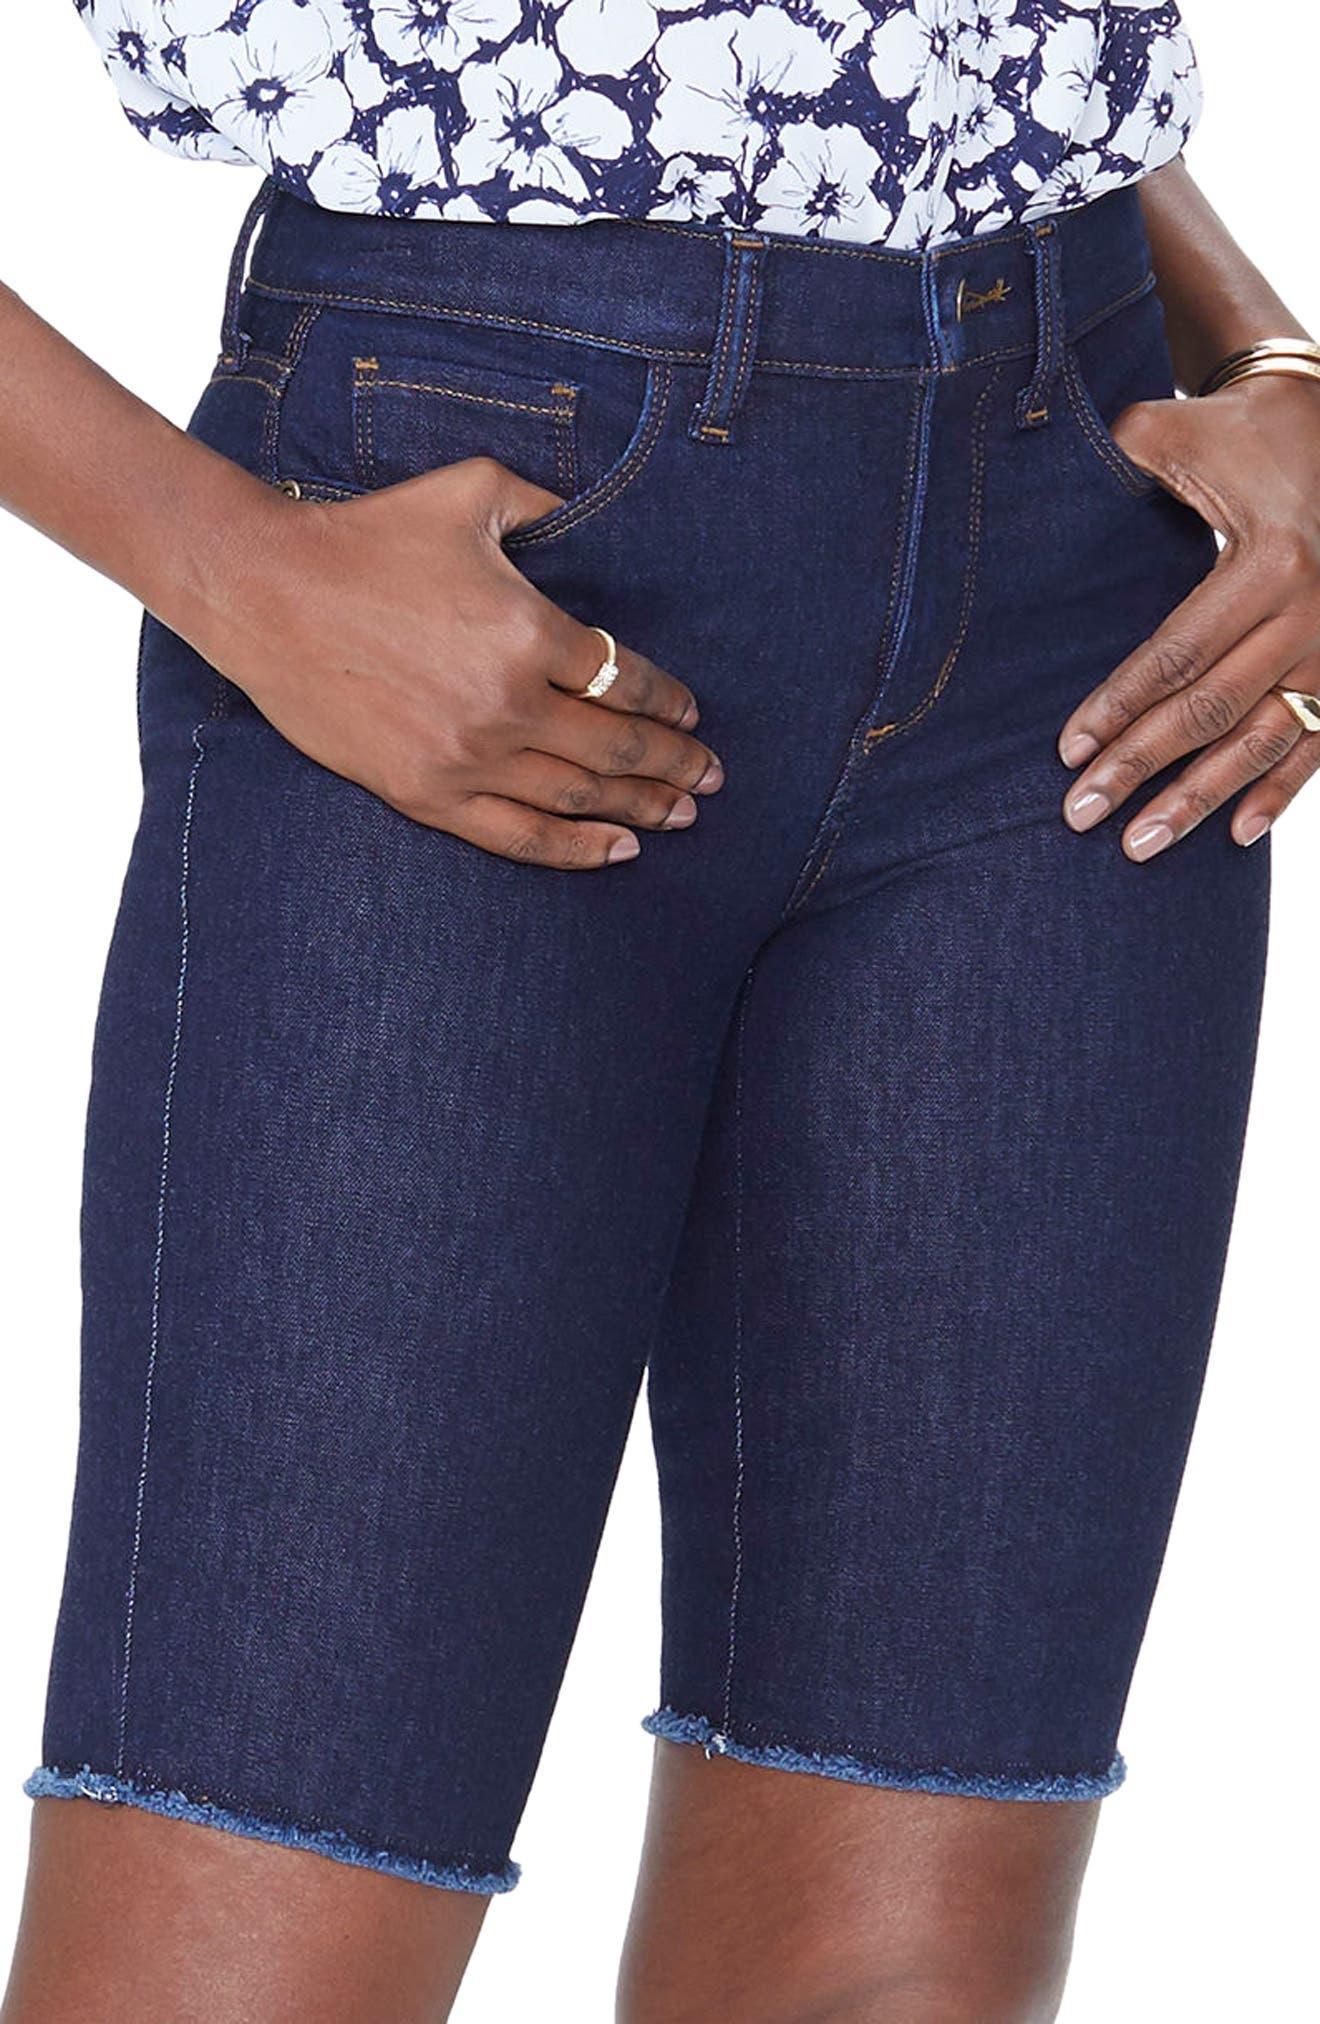 Briella Fray Hem Denim Bermuda Shorts,                             Main thumbnail 1, color,                             408